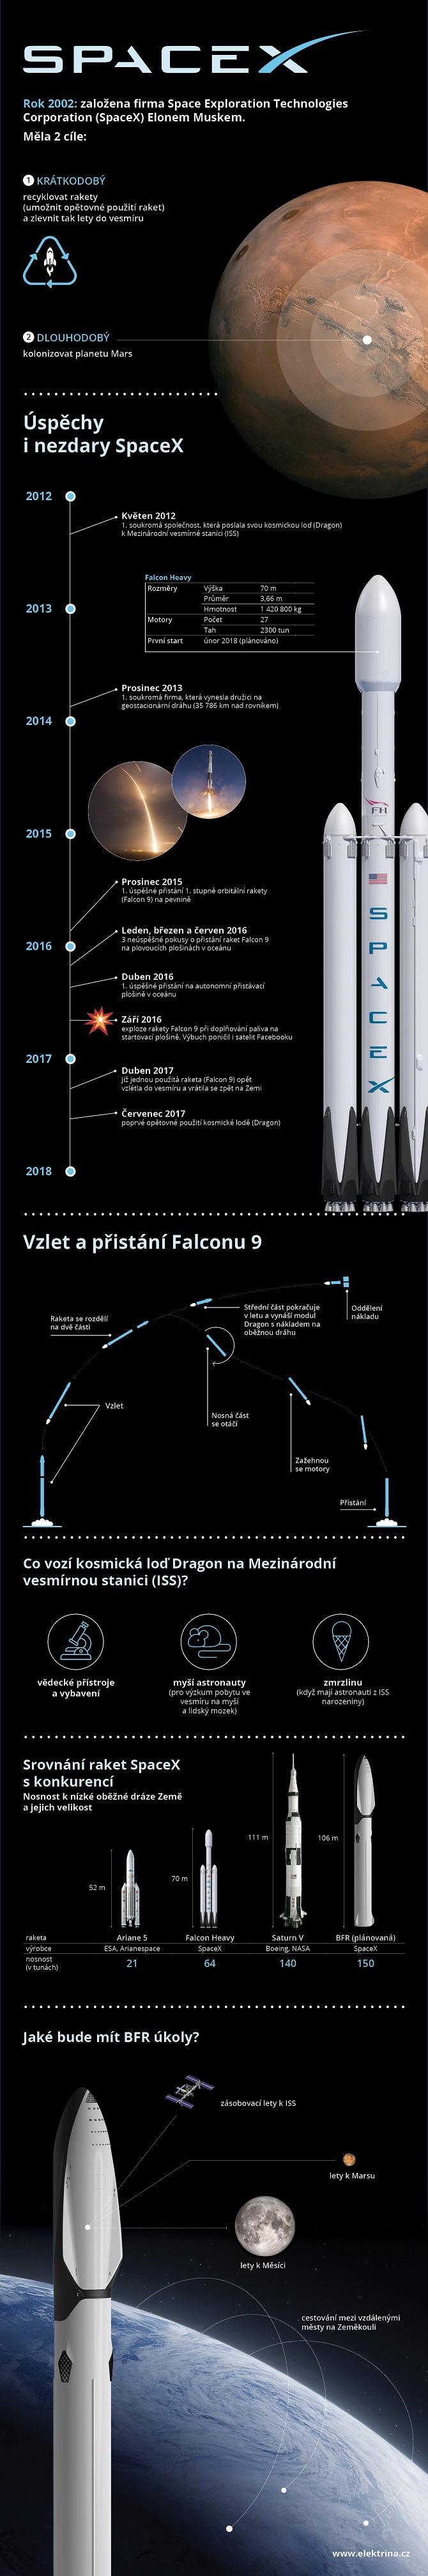 SpaceX infografika